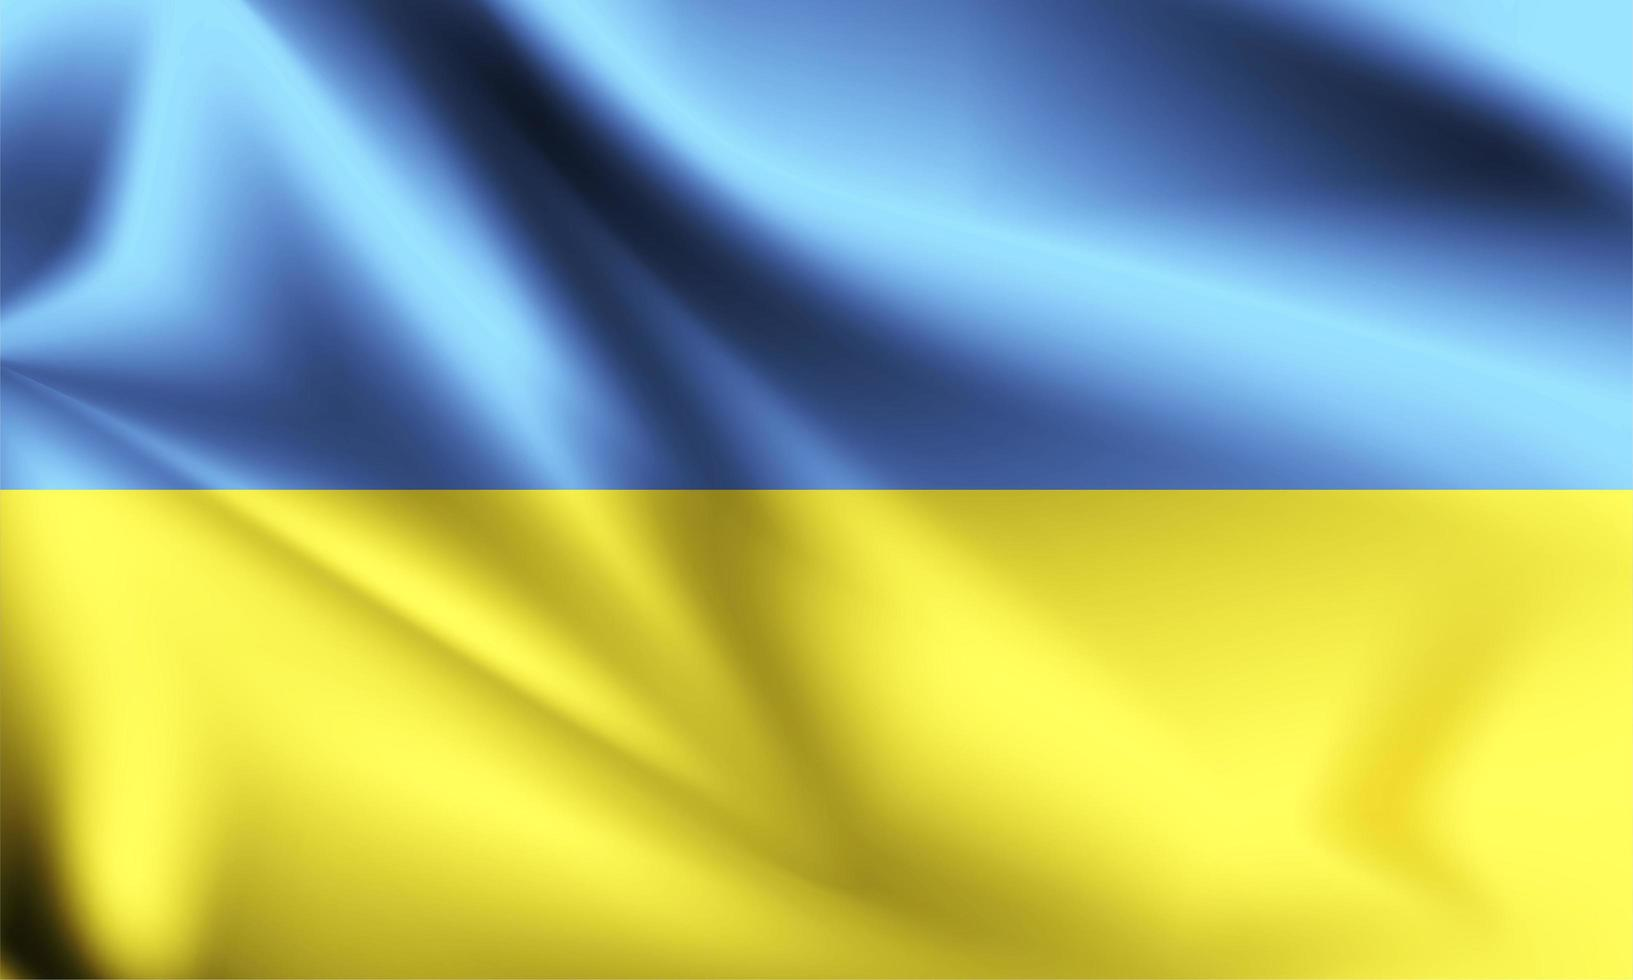 Ucrania Bandera 3d Con Pliegues 1229034 Vector En Vecteezy